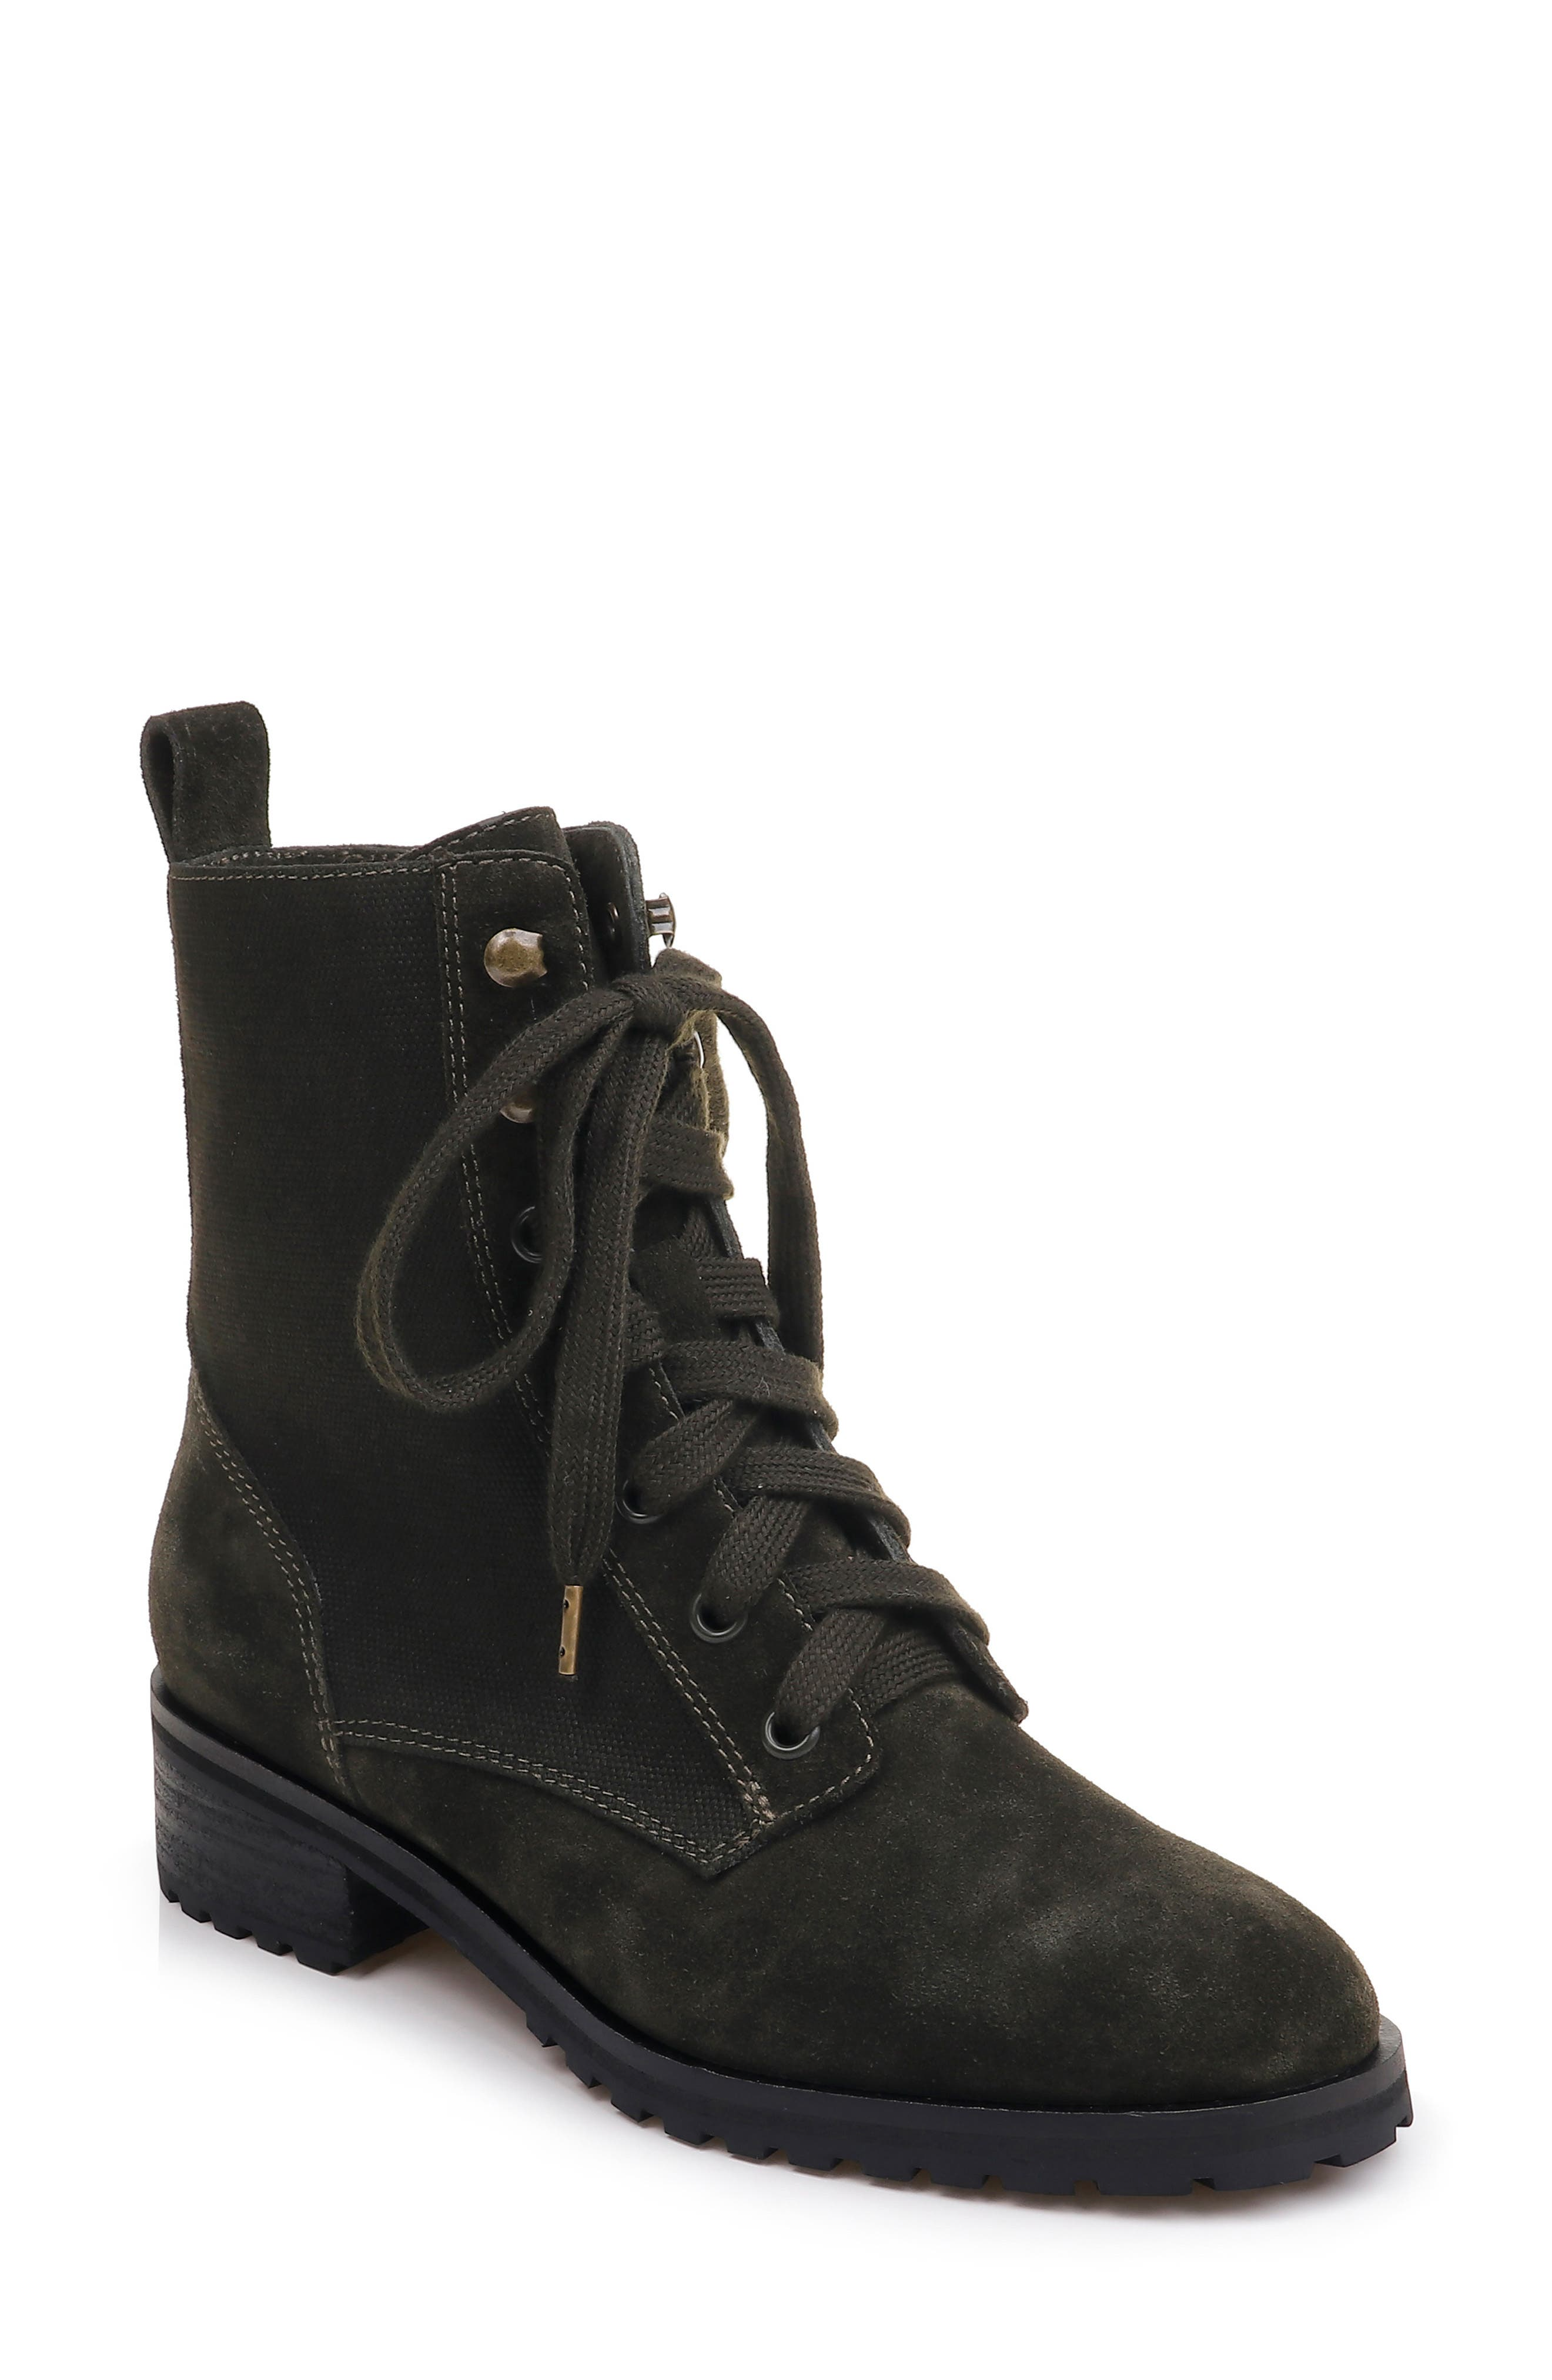 Splendid Hermilla Lace-Up Boot, Green